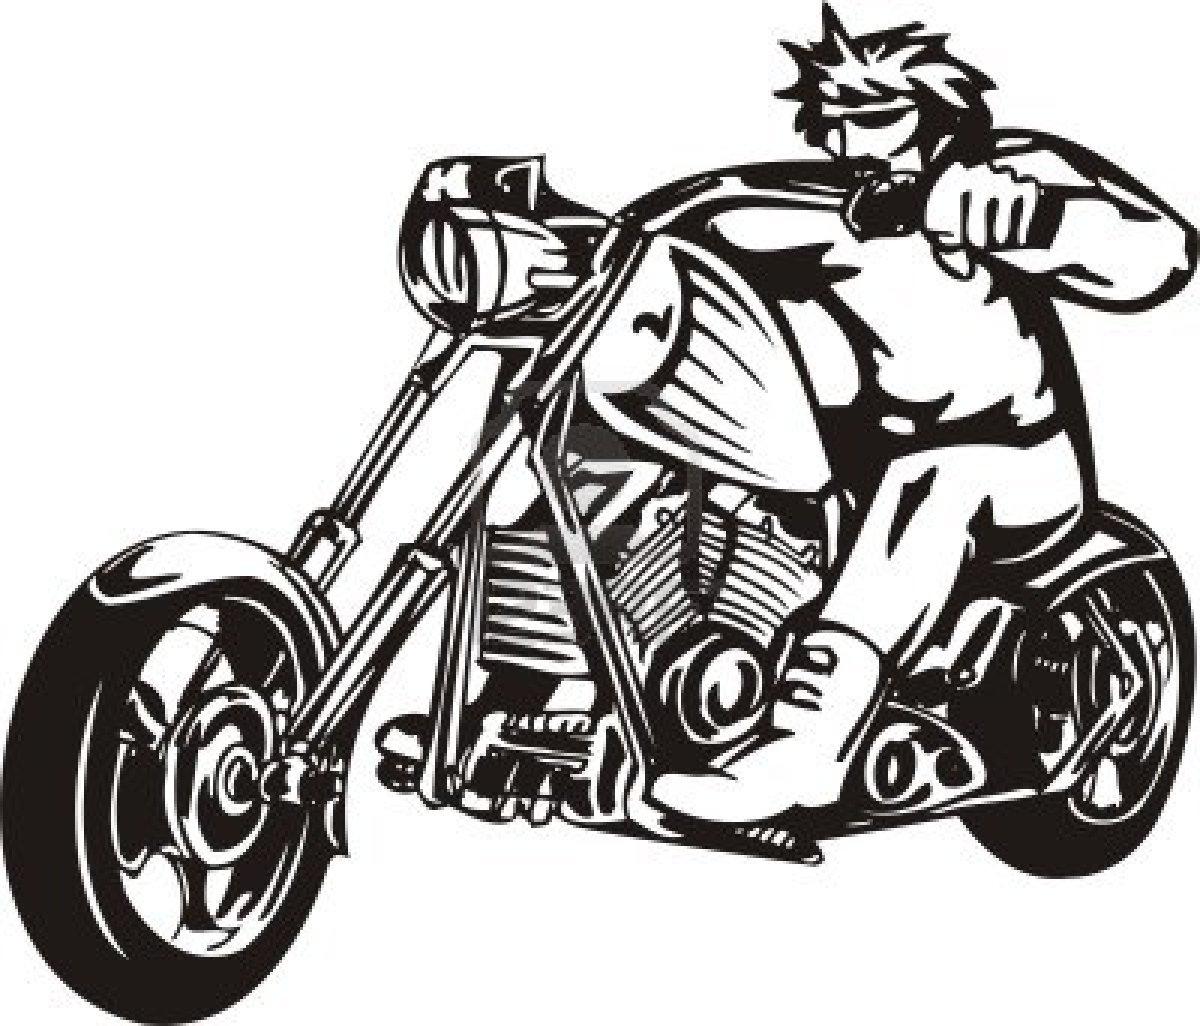 Harley Davidson Motorcycle Clip Art Motorcycle